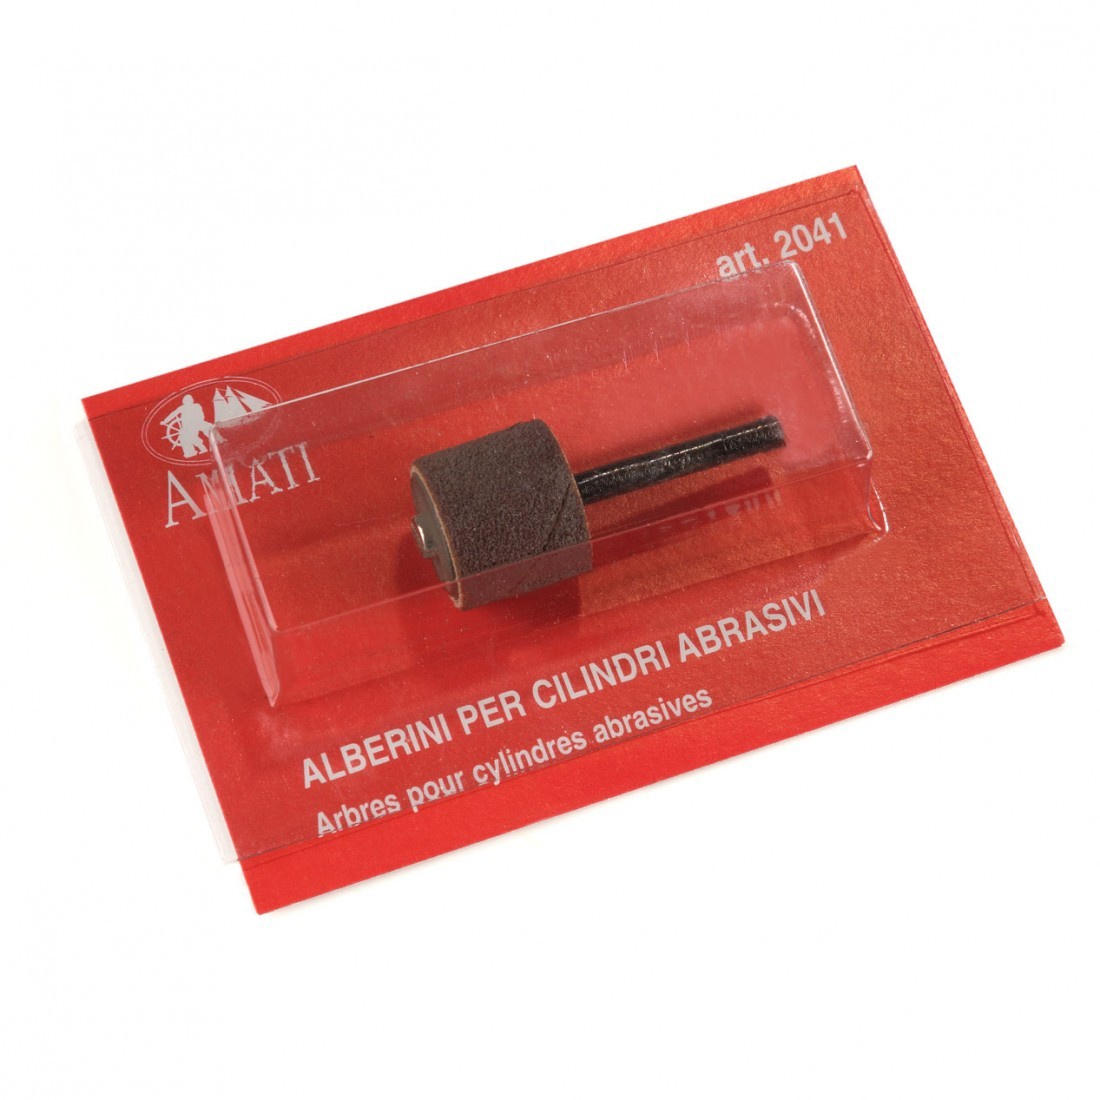 Alberini per Cilindri Abrasivi Ø gambo mm. 2,3